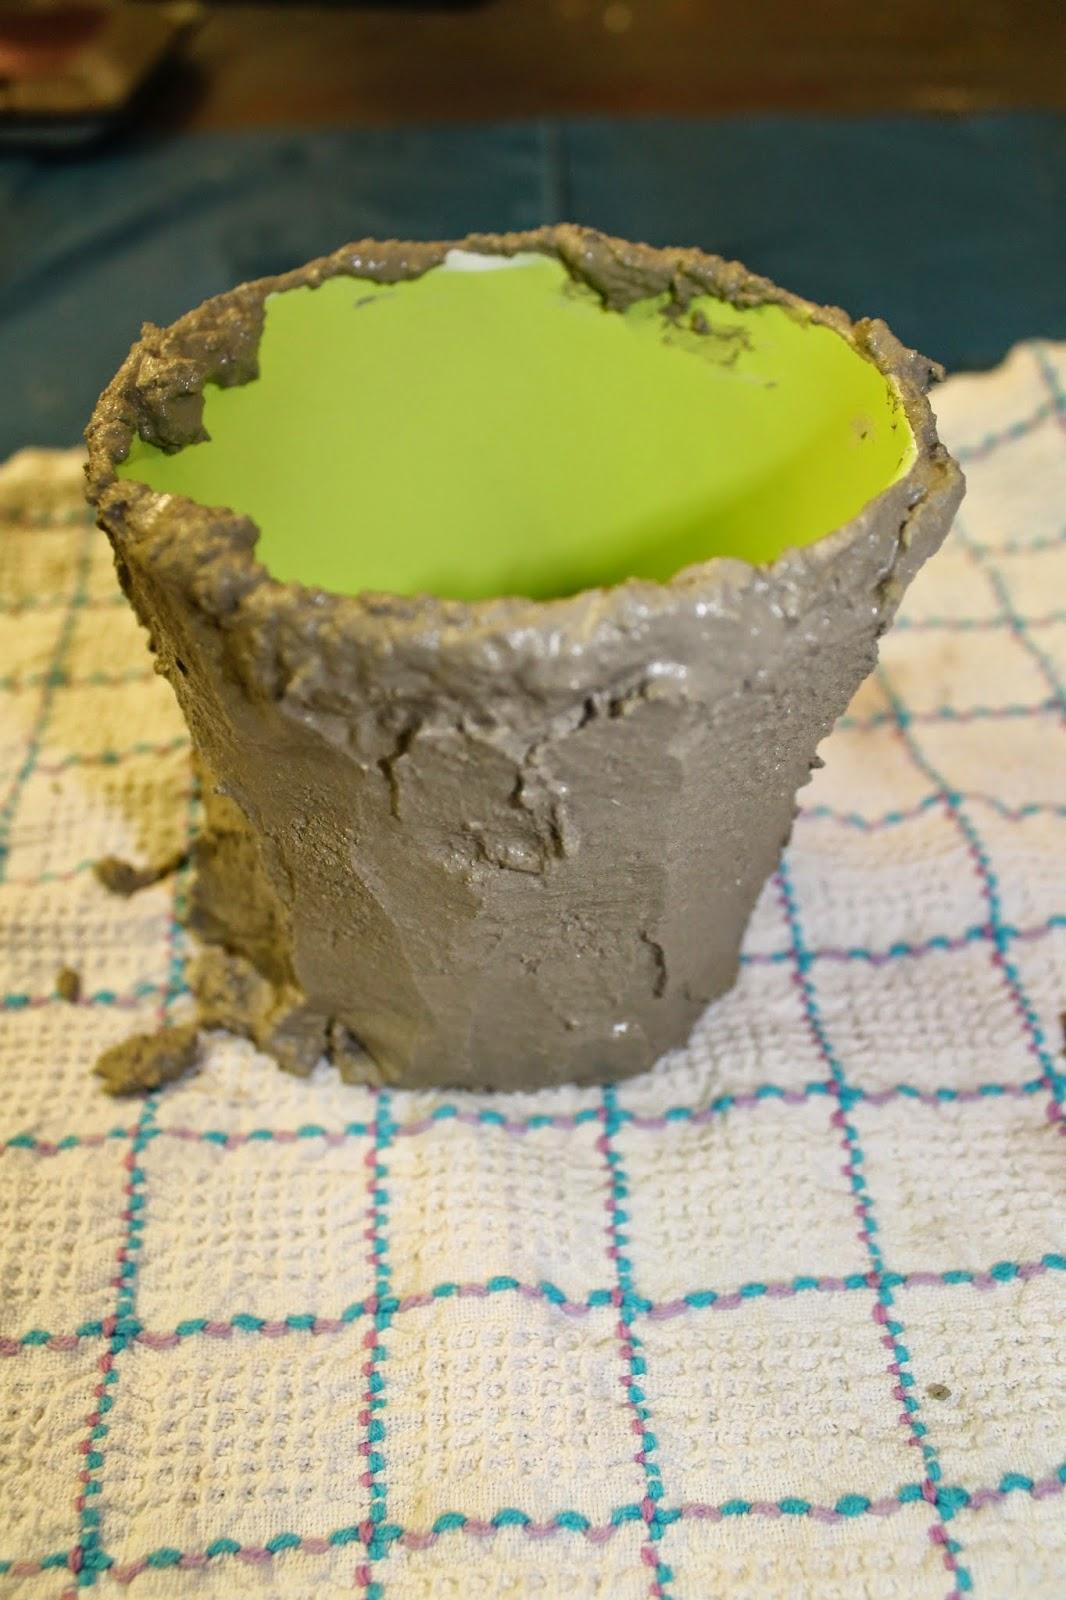 beates kreative welten beton zum gie en. Black Bedroom Furniture Sets. Home Design Ideas